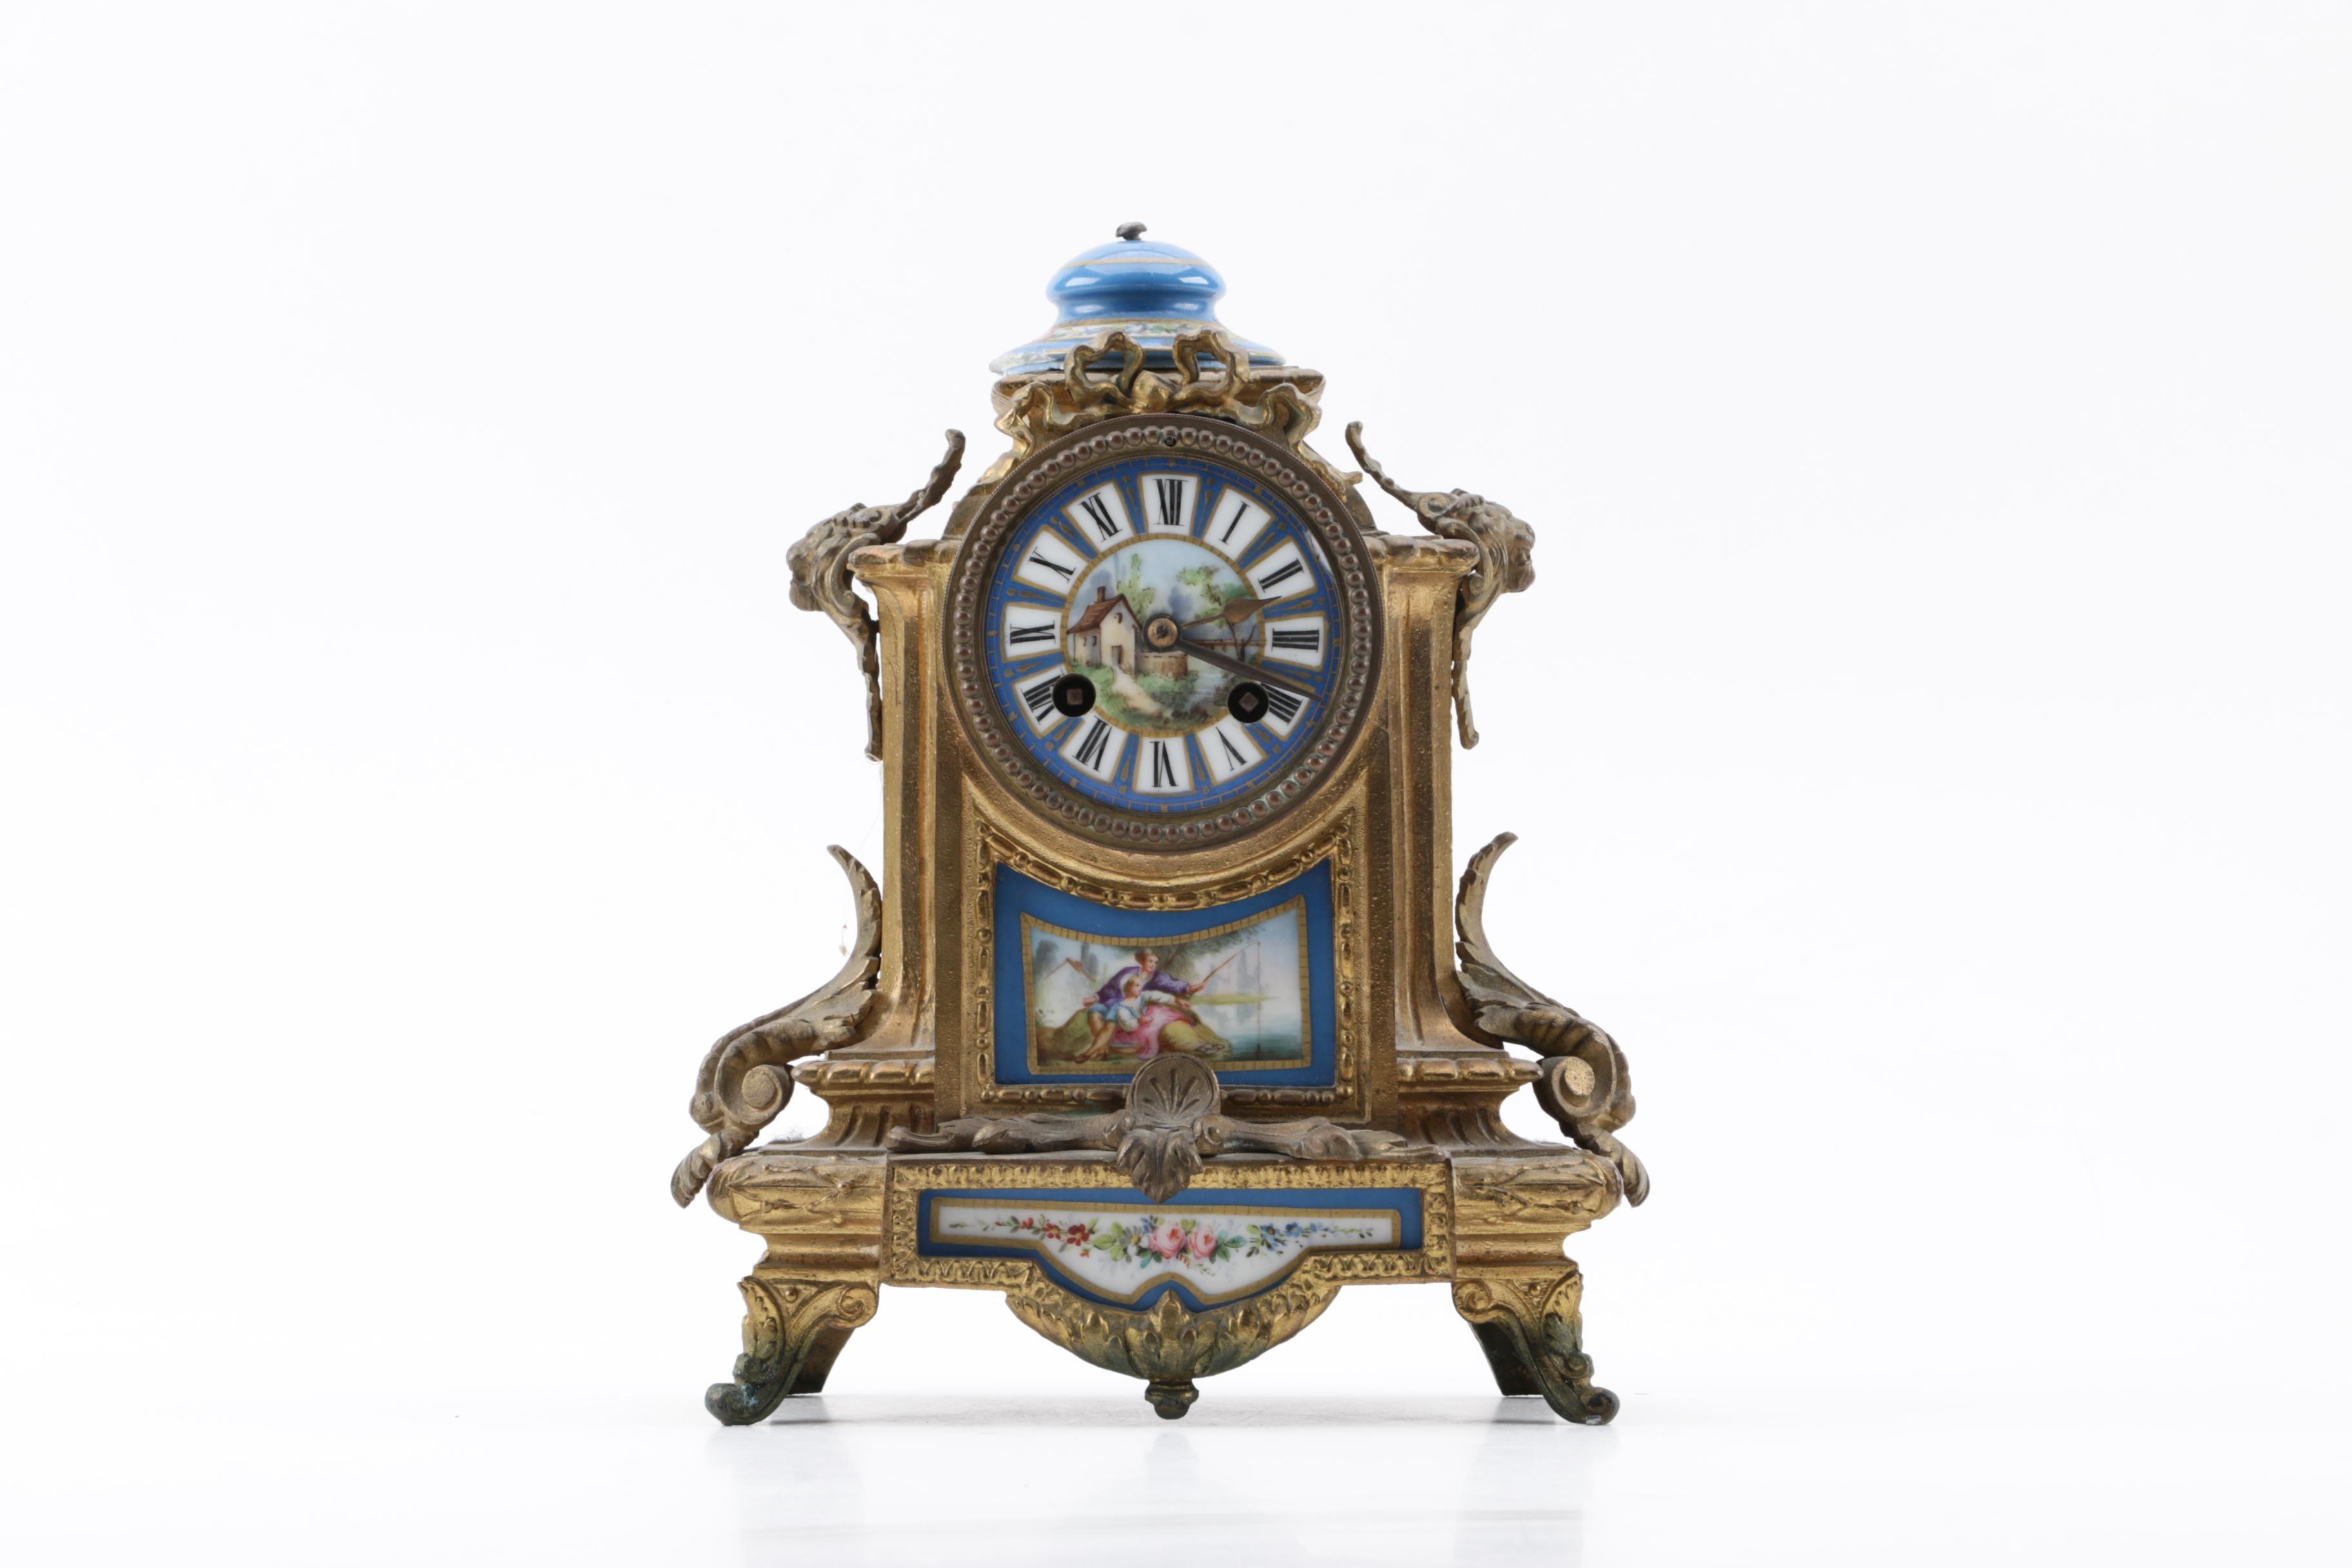 Antique brass french mantel clocks